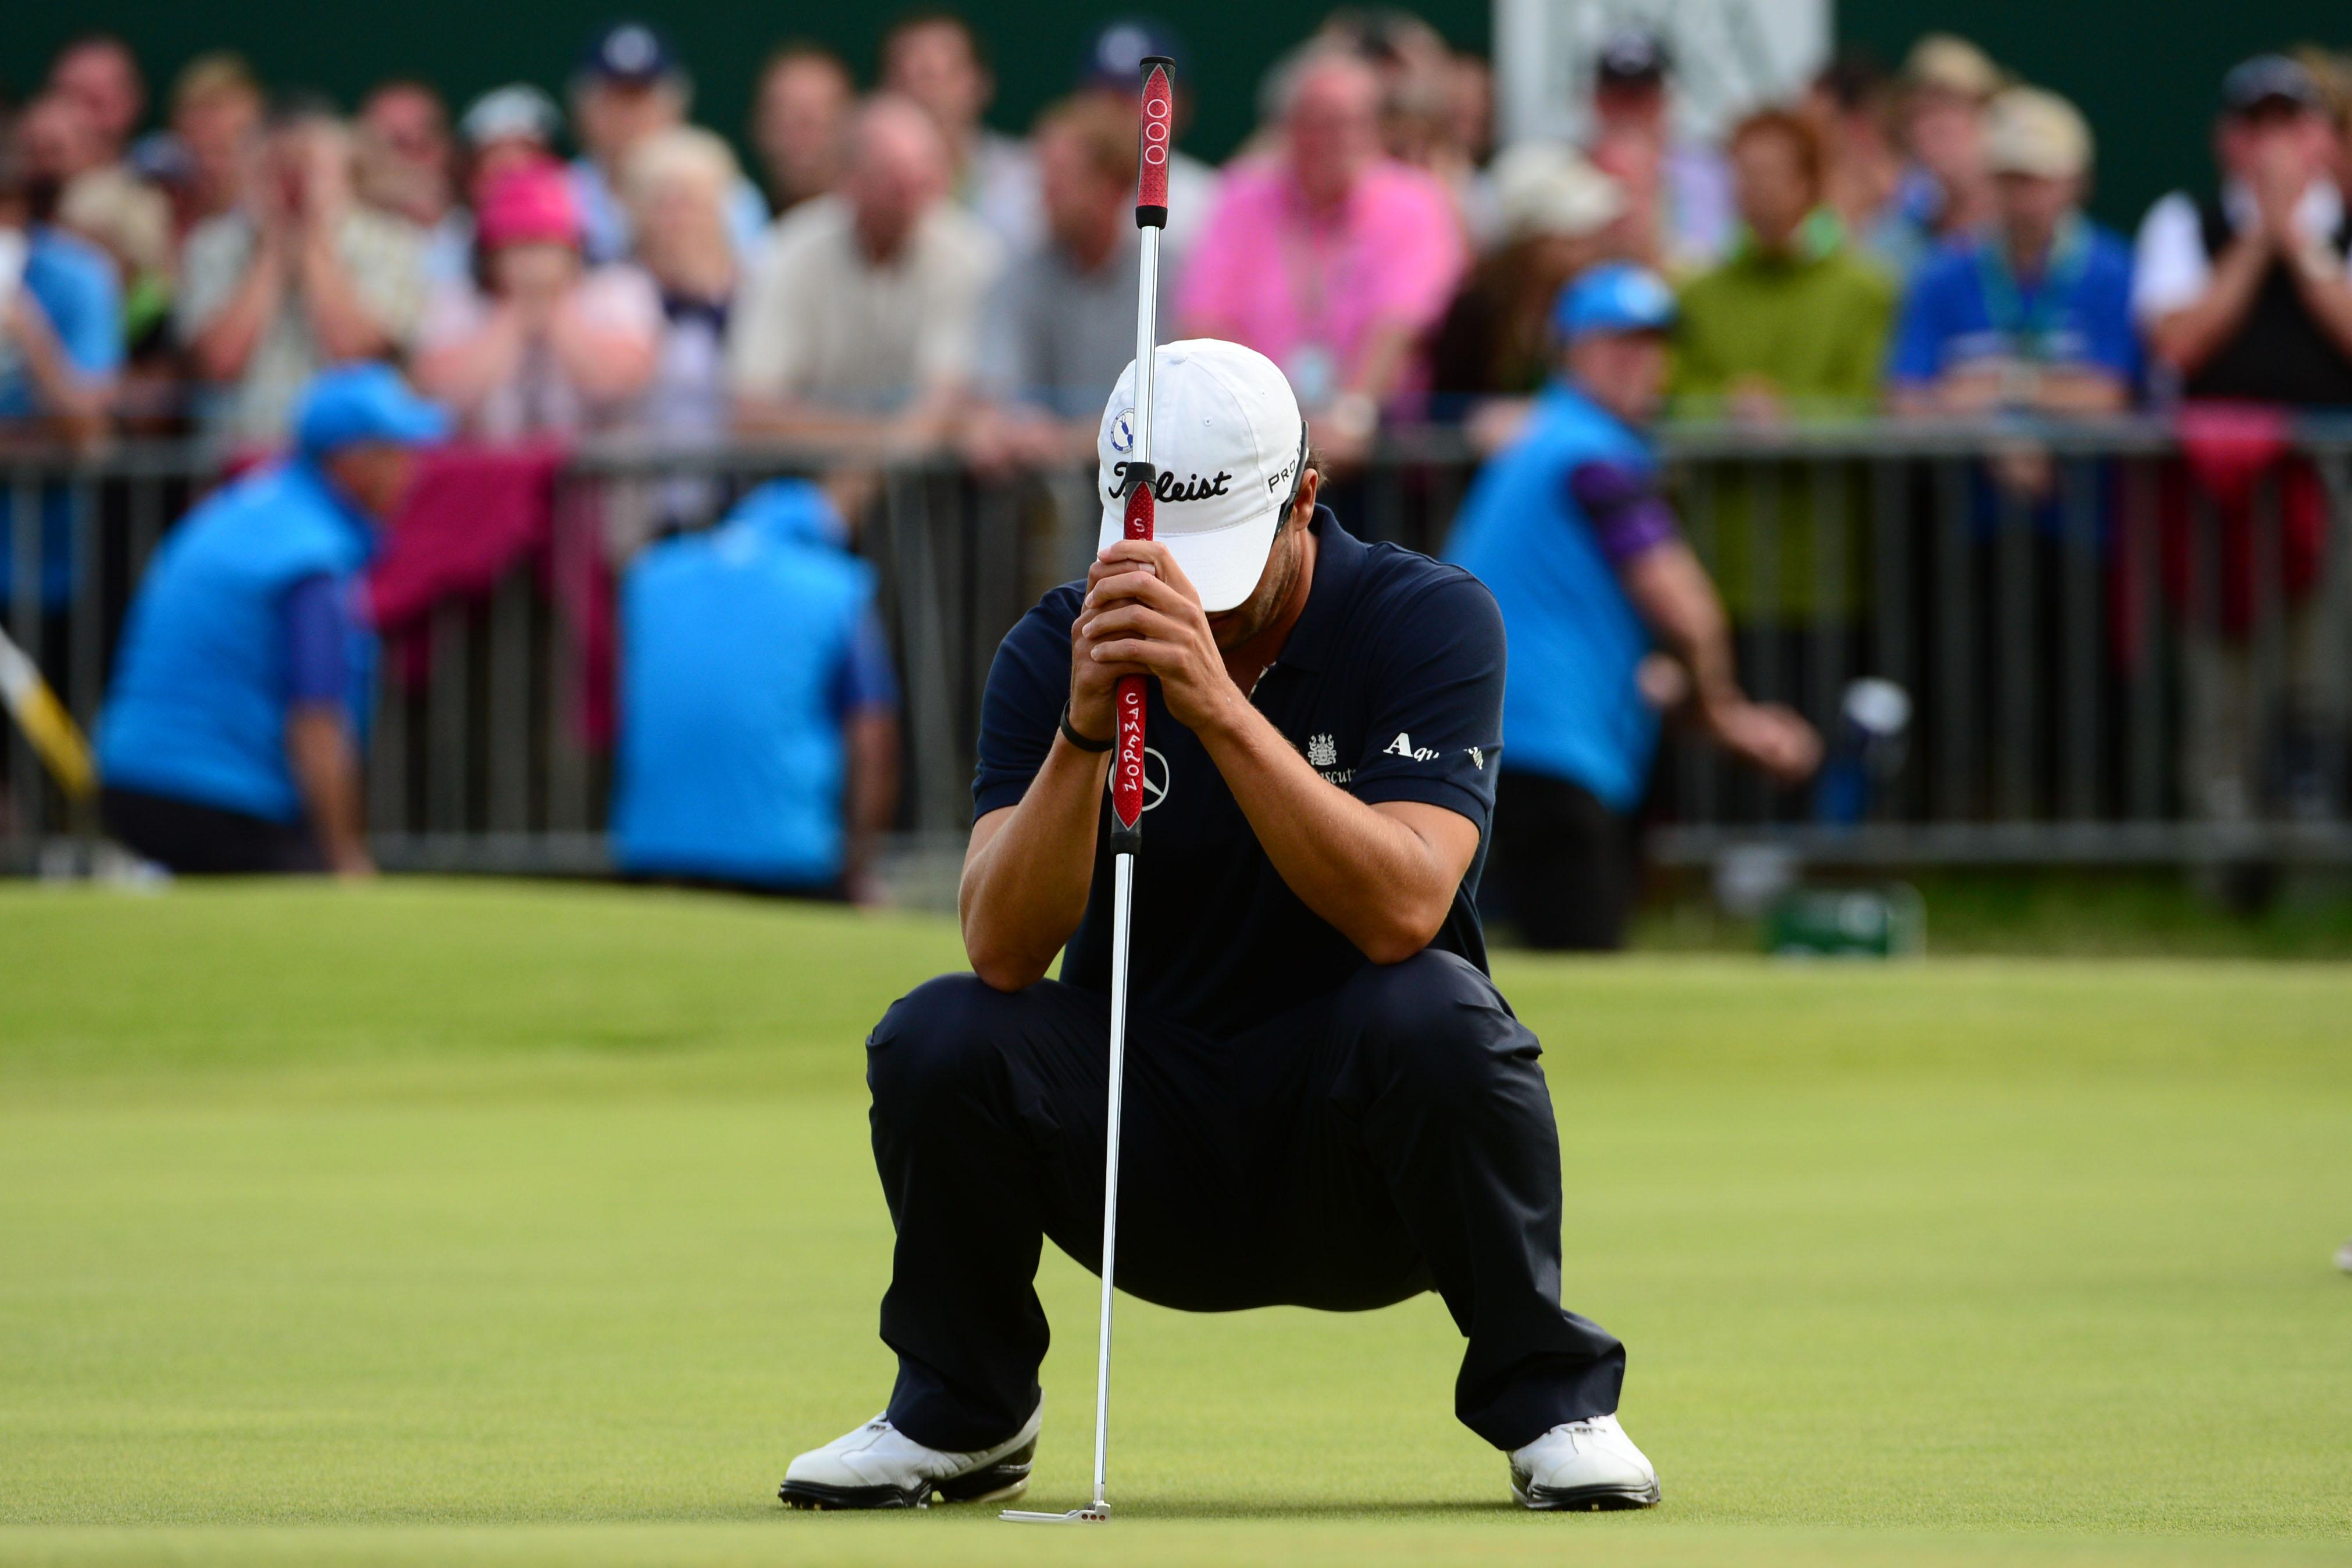 the ungrateful game of golf